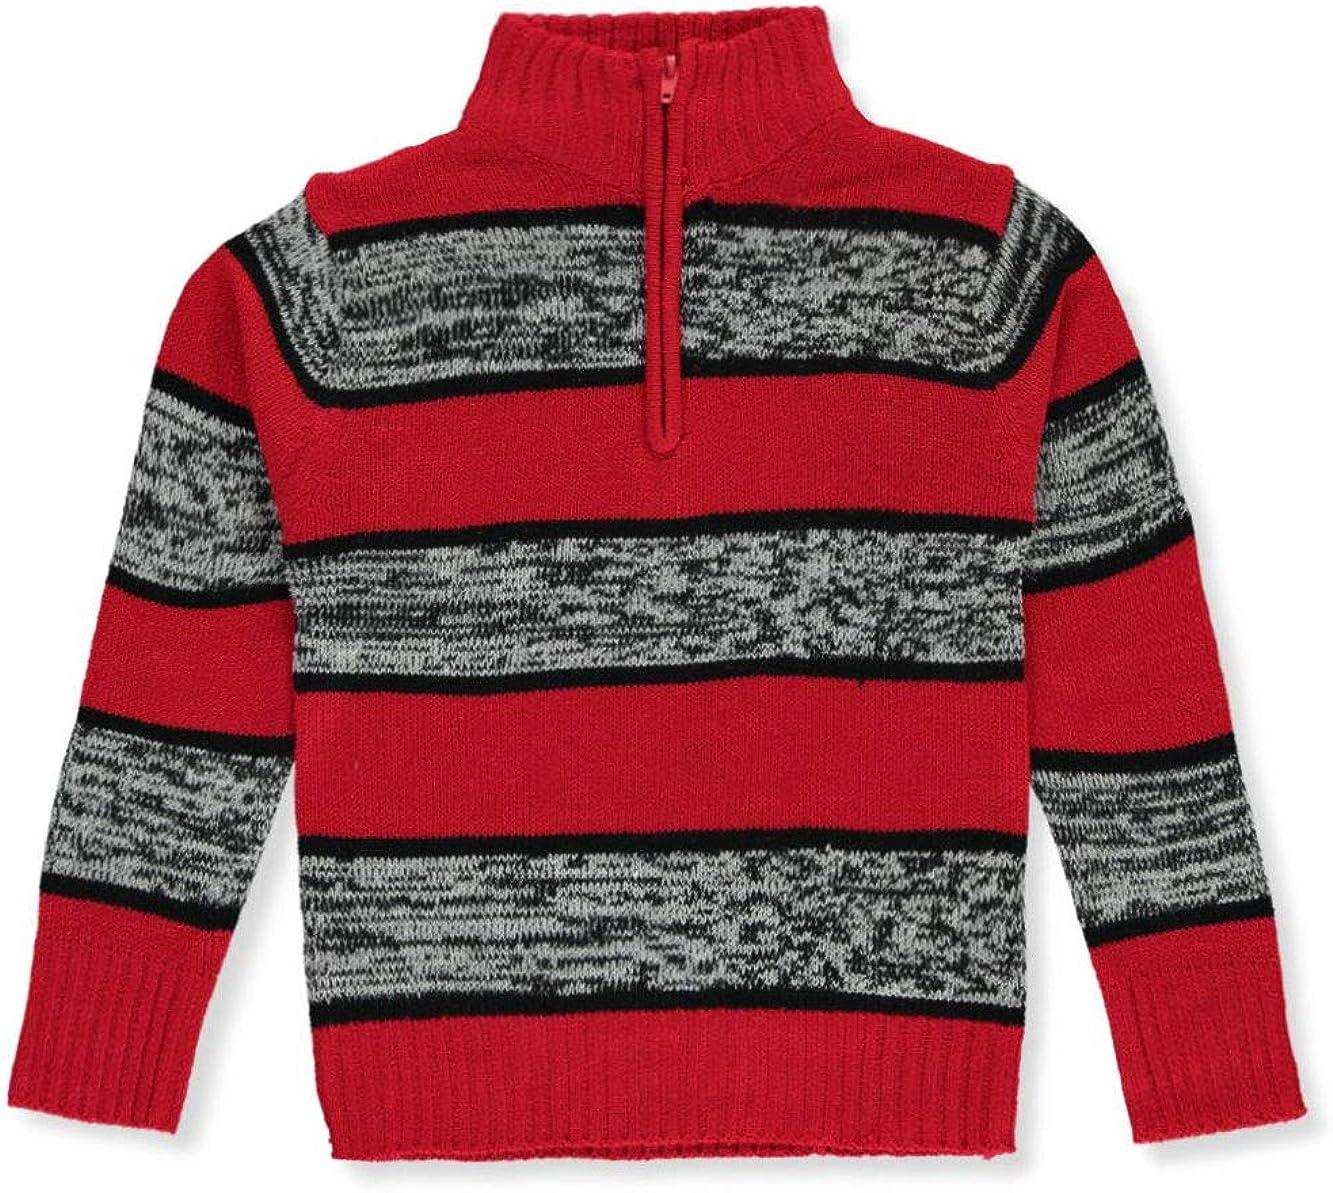 Sezzit Boys Striped Mock Neck Sweater